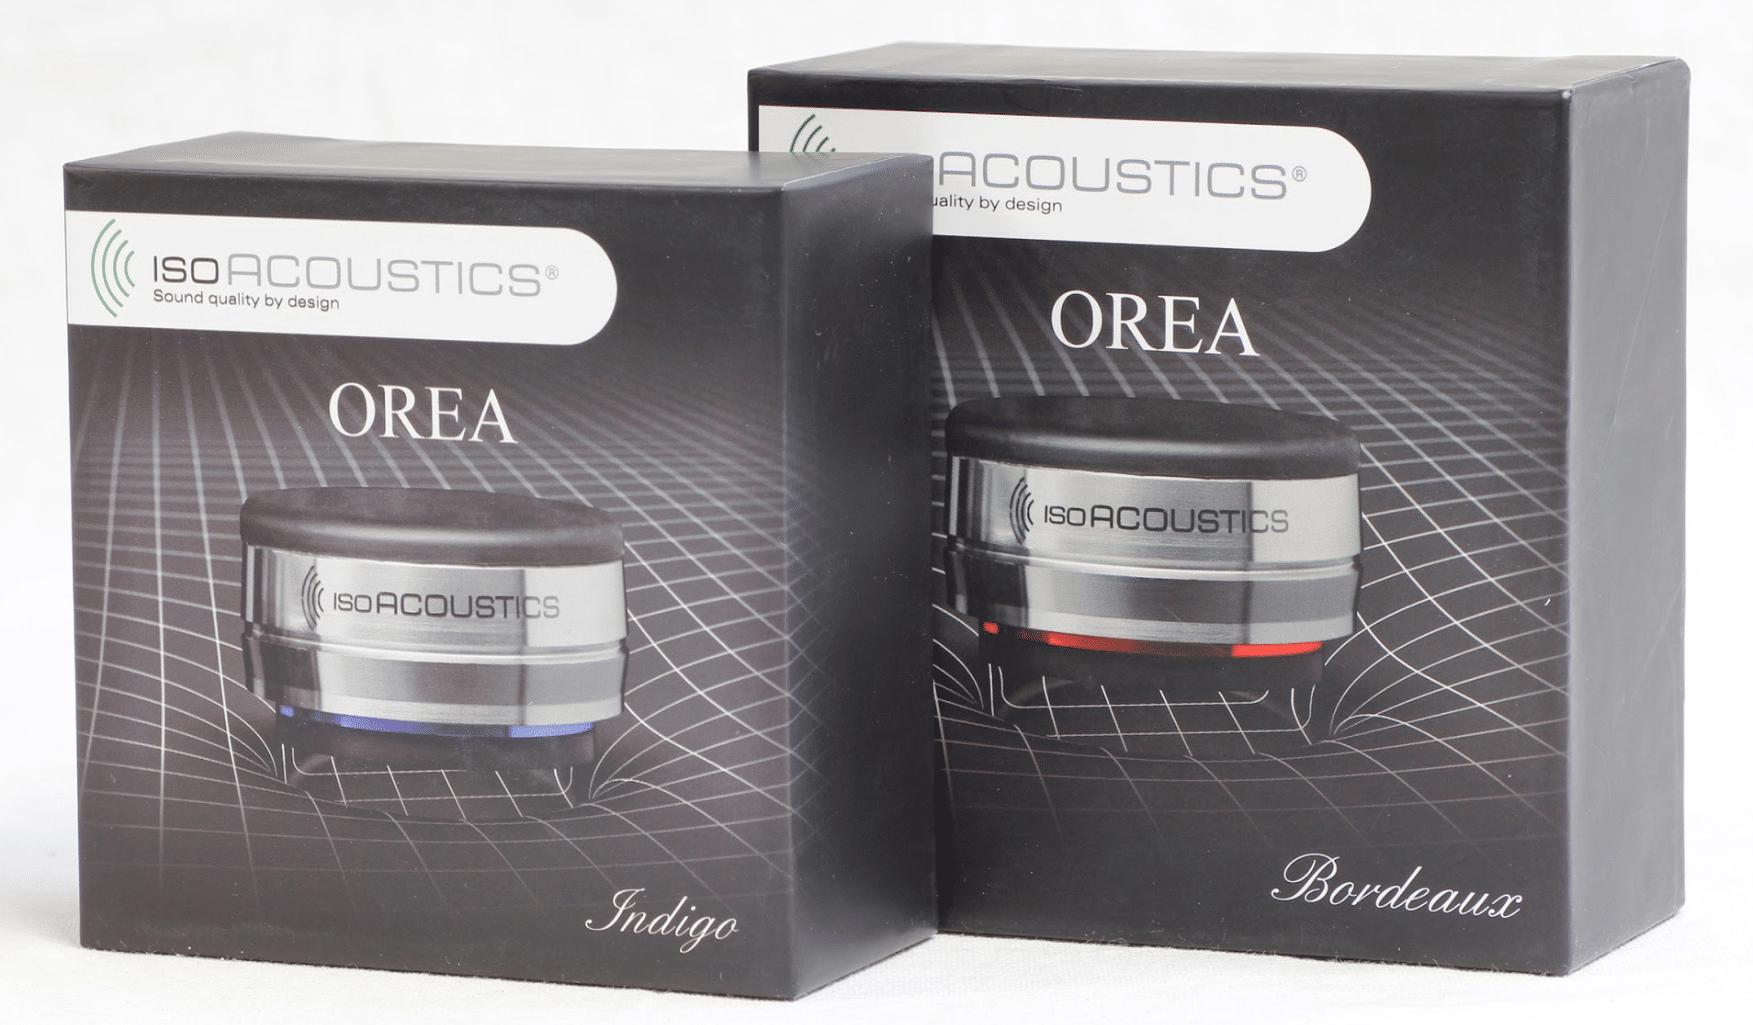 IsoAcoustics OREA – Isolation Pucks